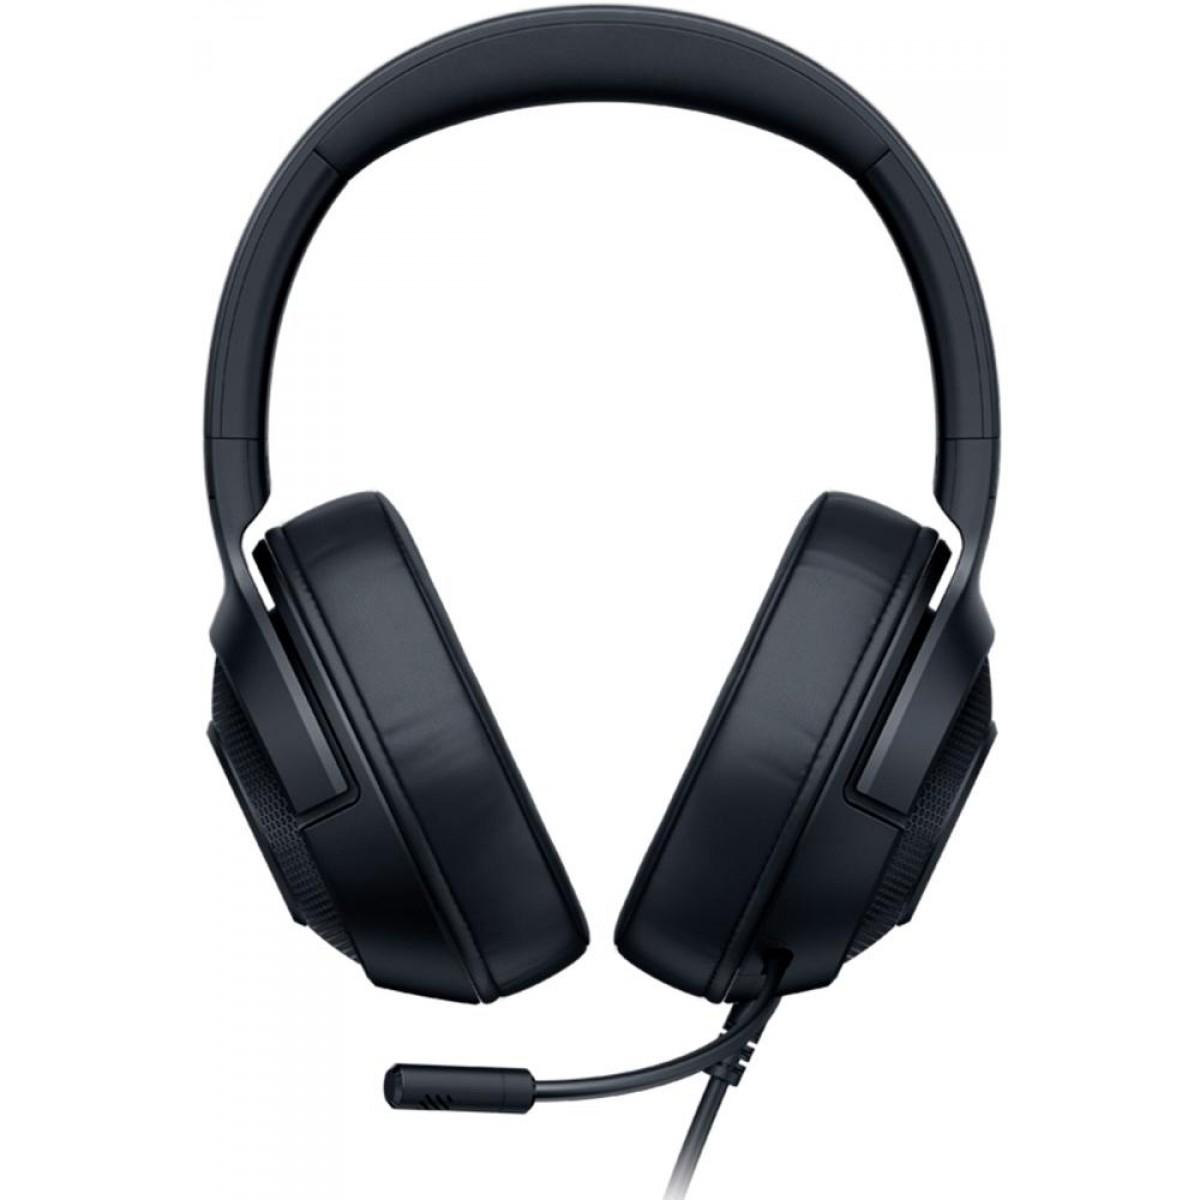 Headset Gamer Razer Kraken X, Xbox One, PS4, Switch, PC, Black